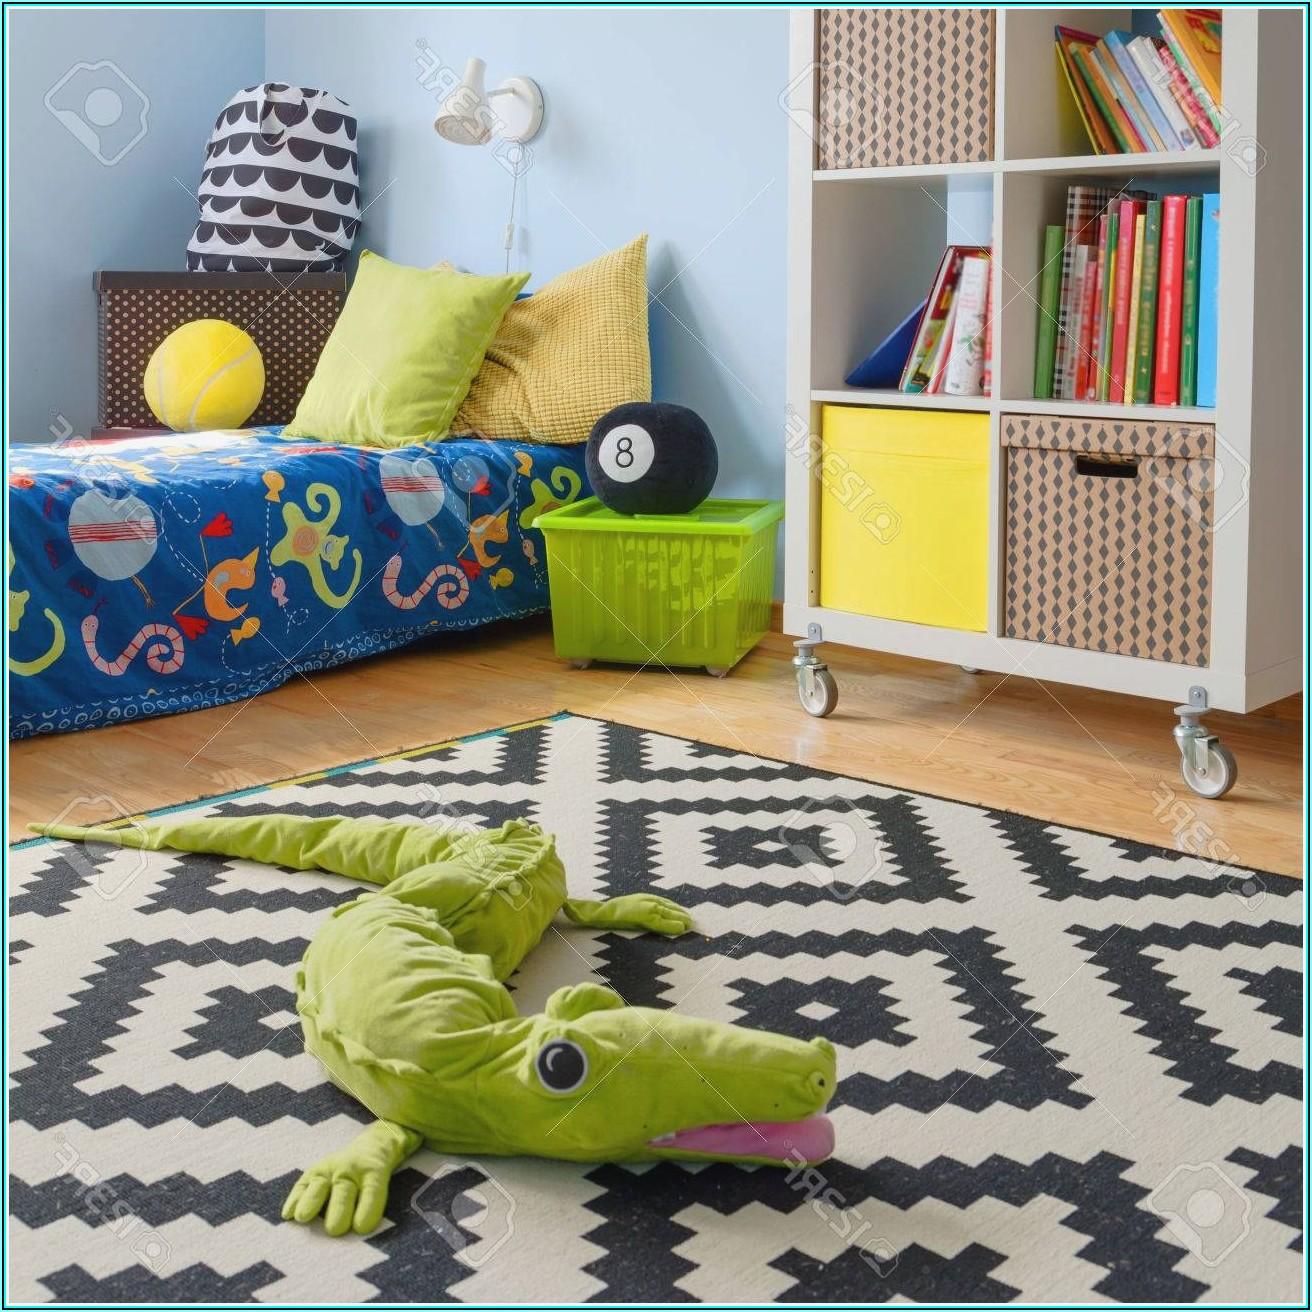 Kalter Boden Kinderzimmer